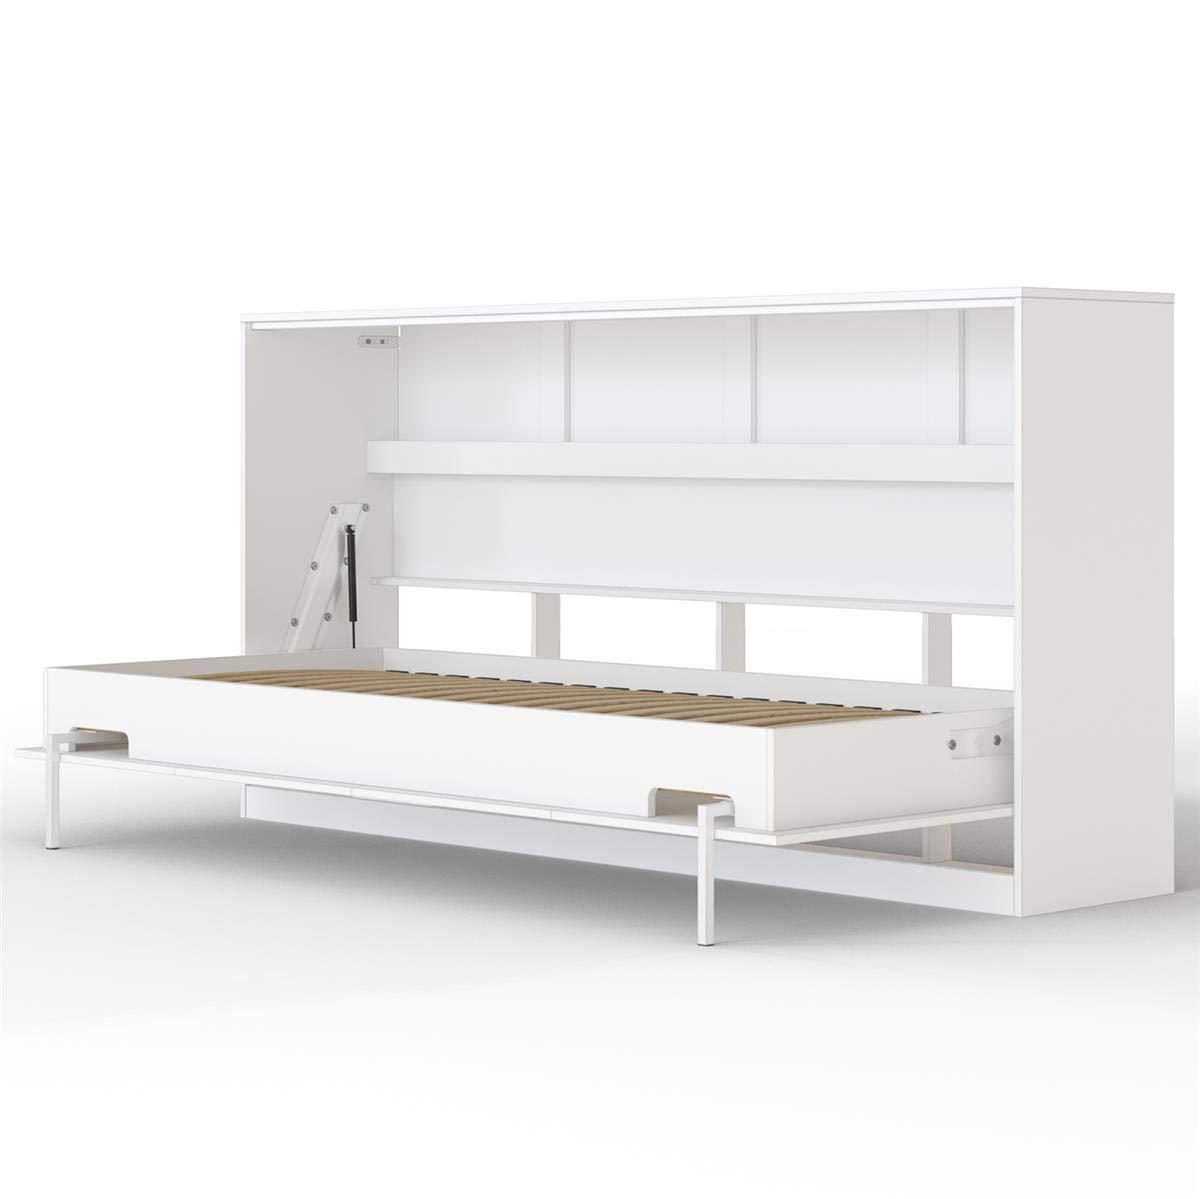 Mejores camas plegables con mueble 2019 oferta camas plegables - Cama pared plegable ...